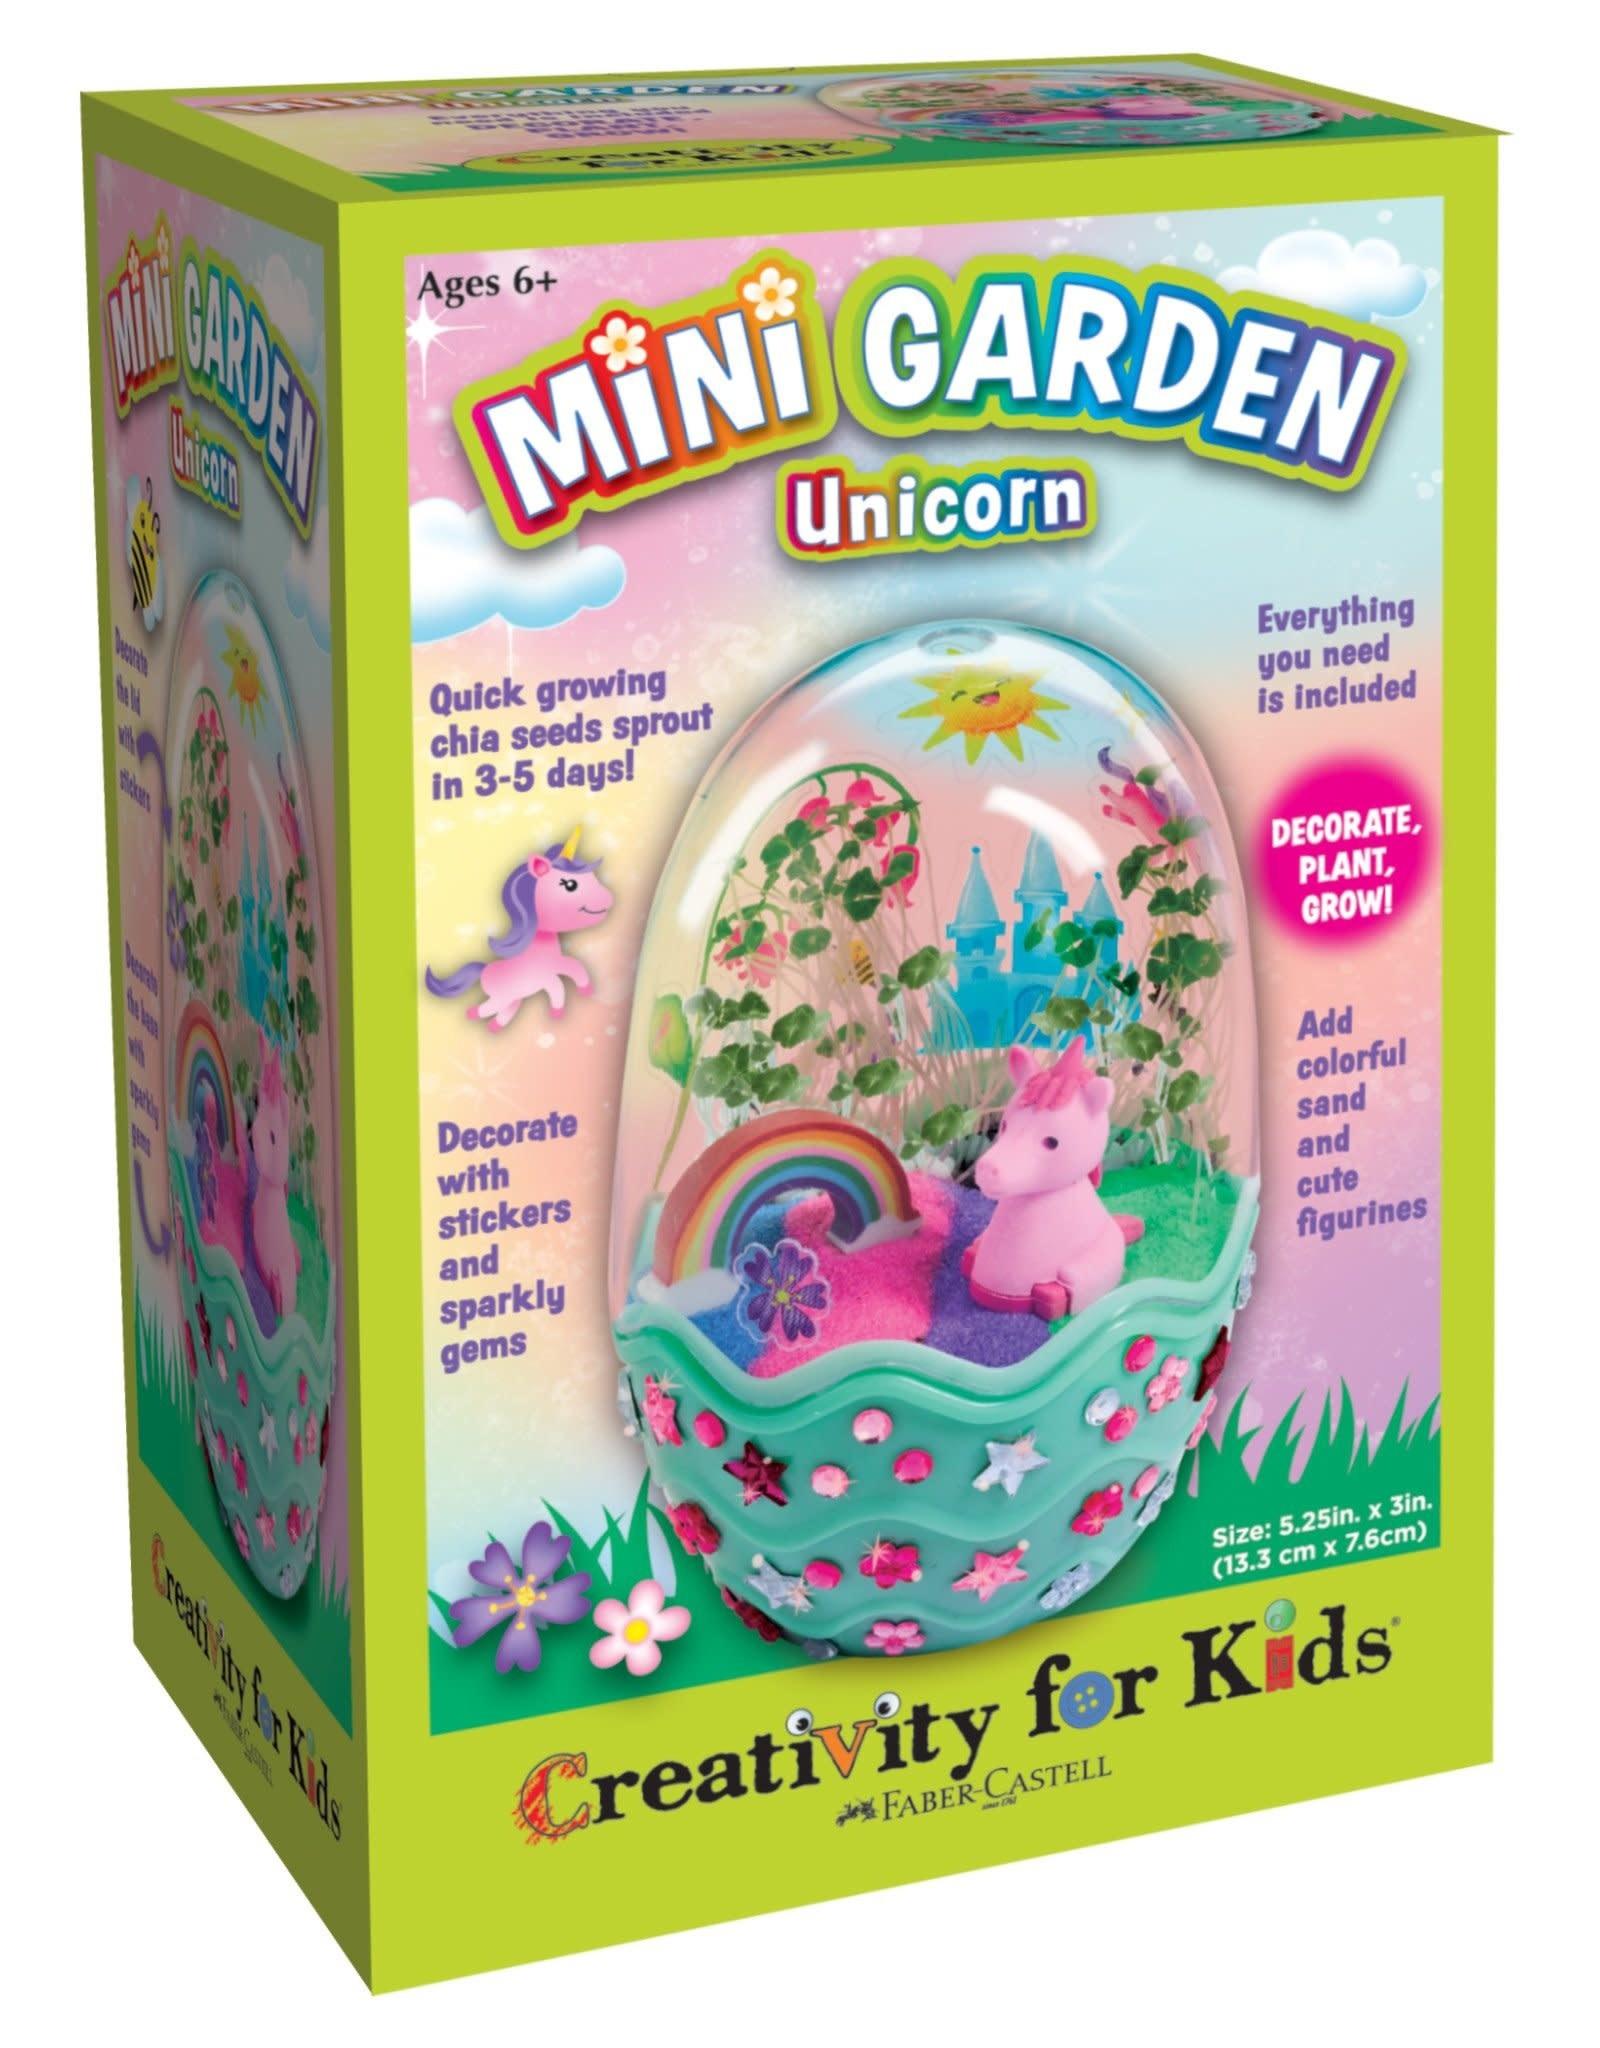 Creativity for Kids Grow Kit Mini Garden Unicorn